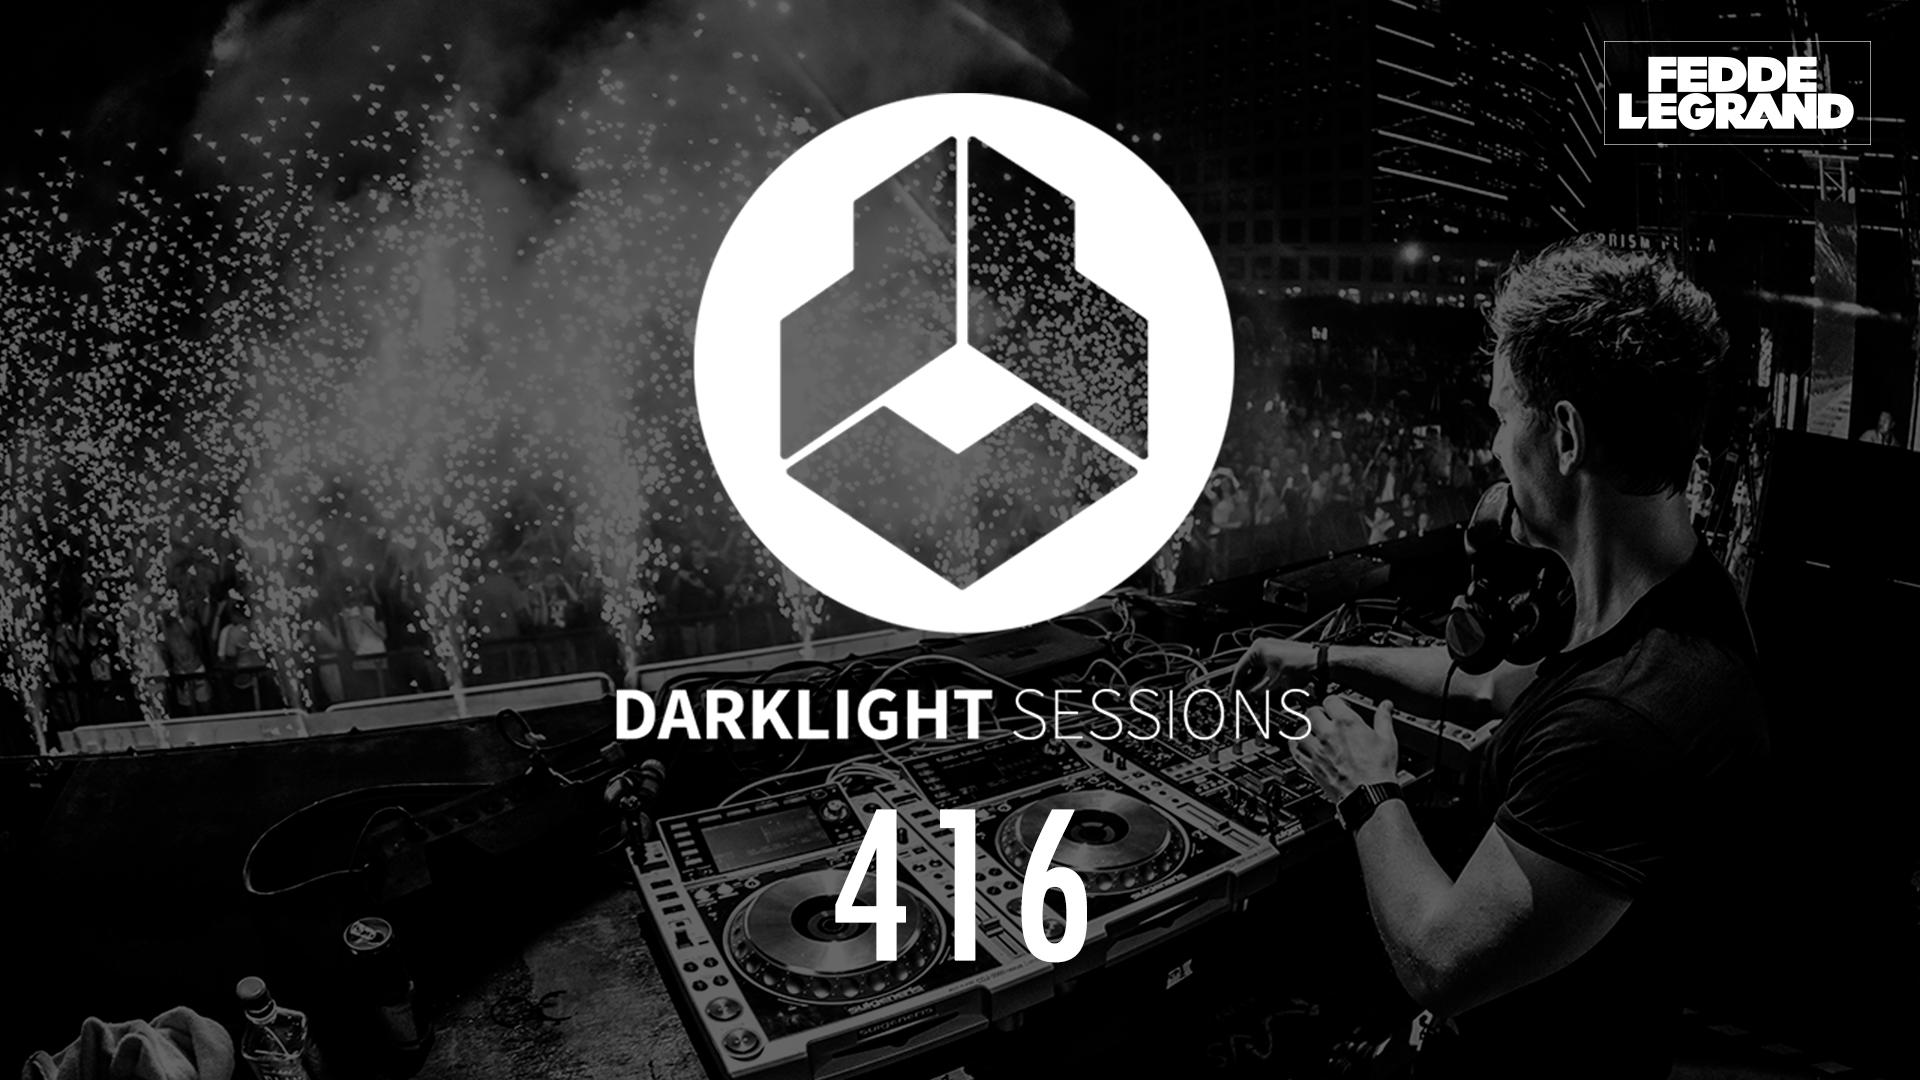 Darklight Sessions 416